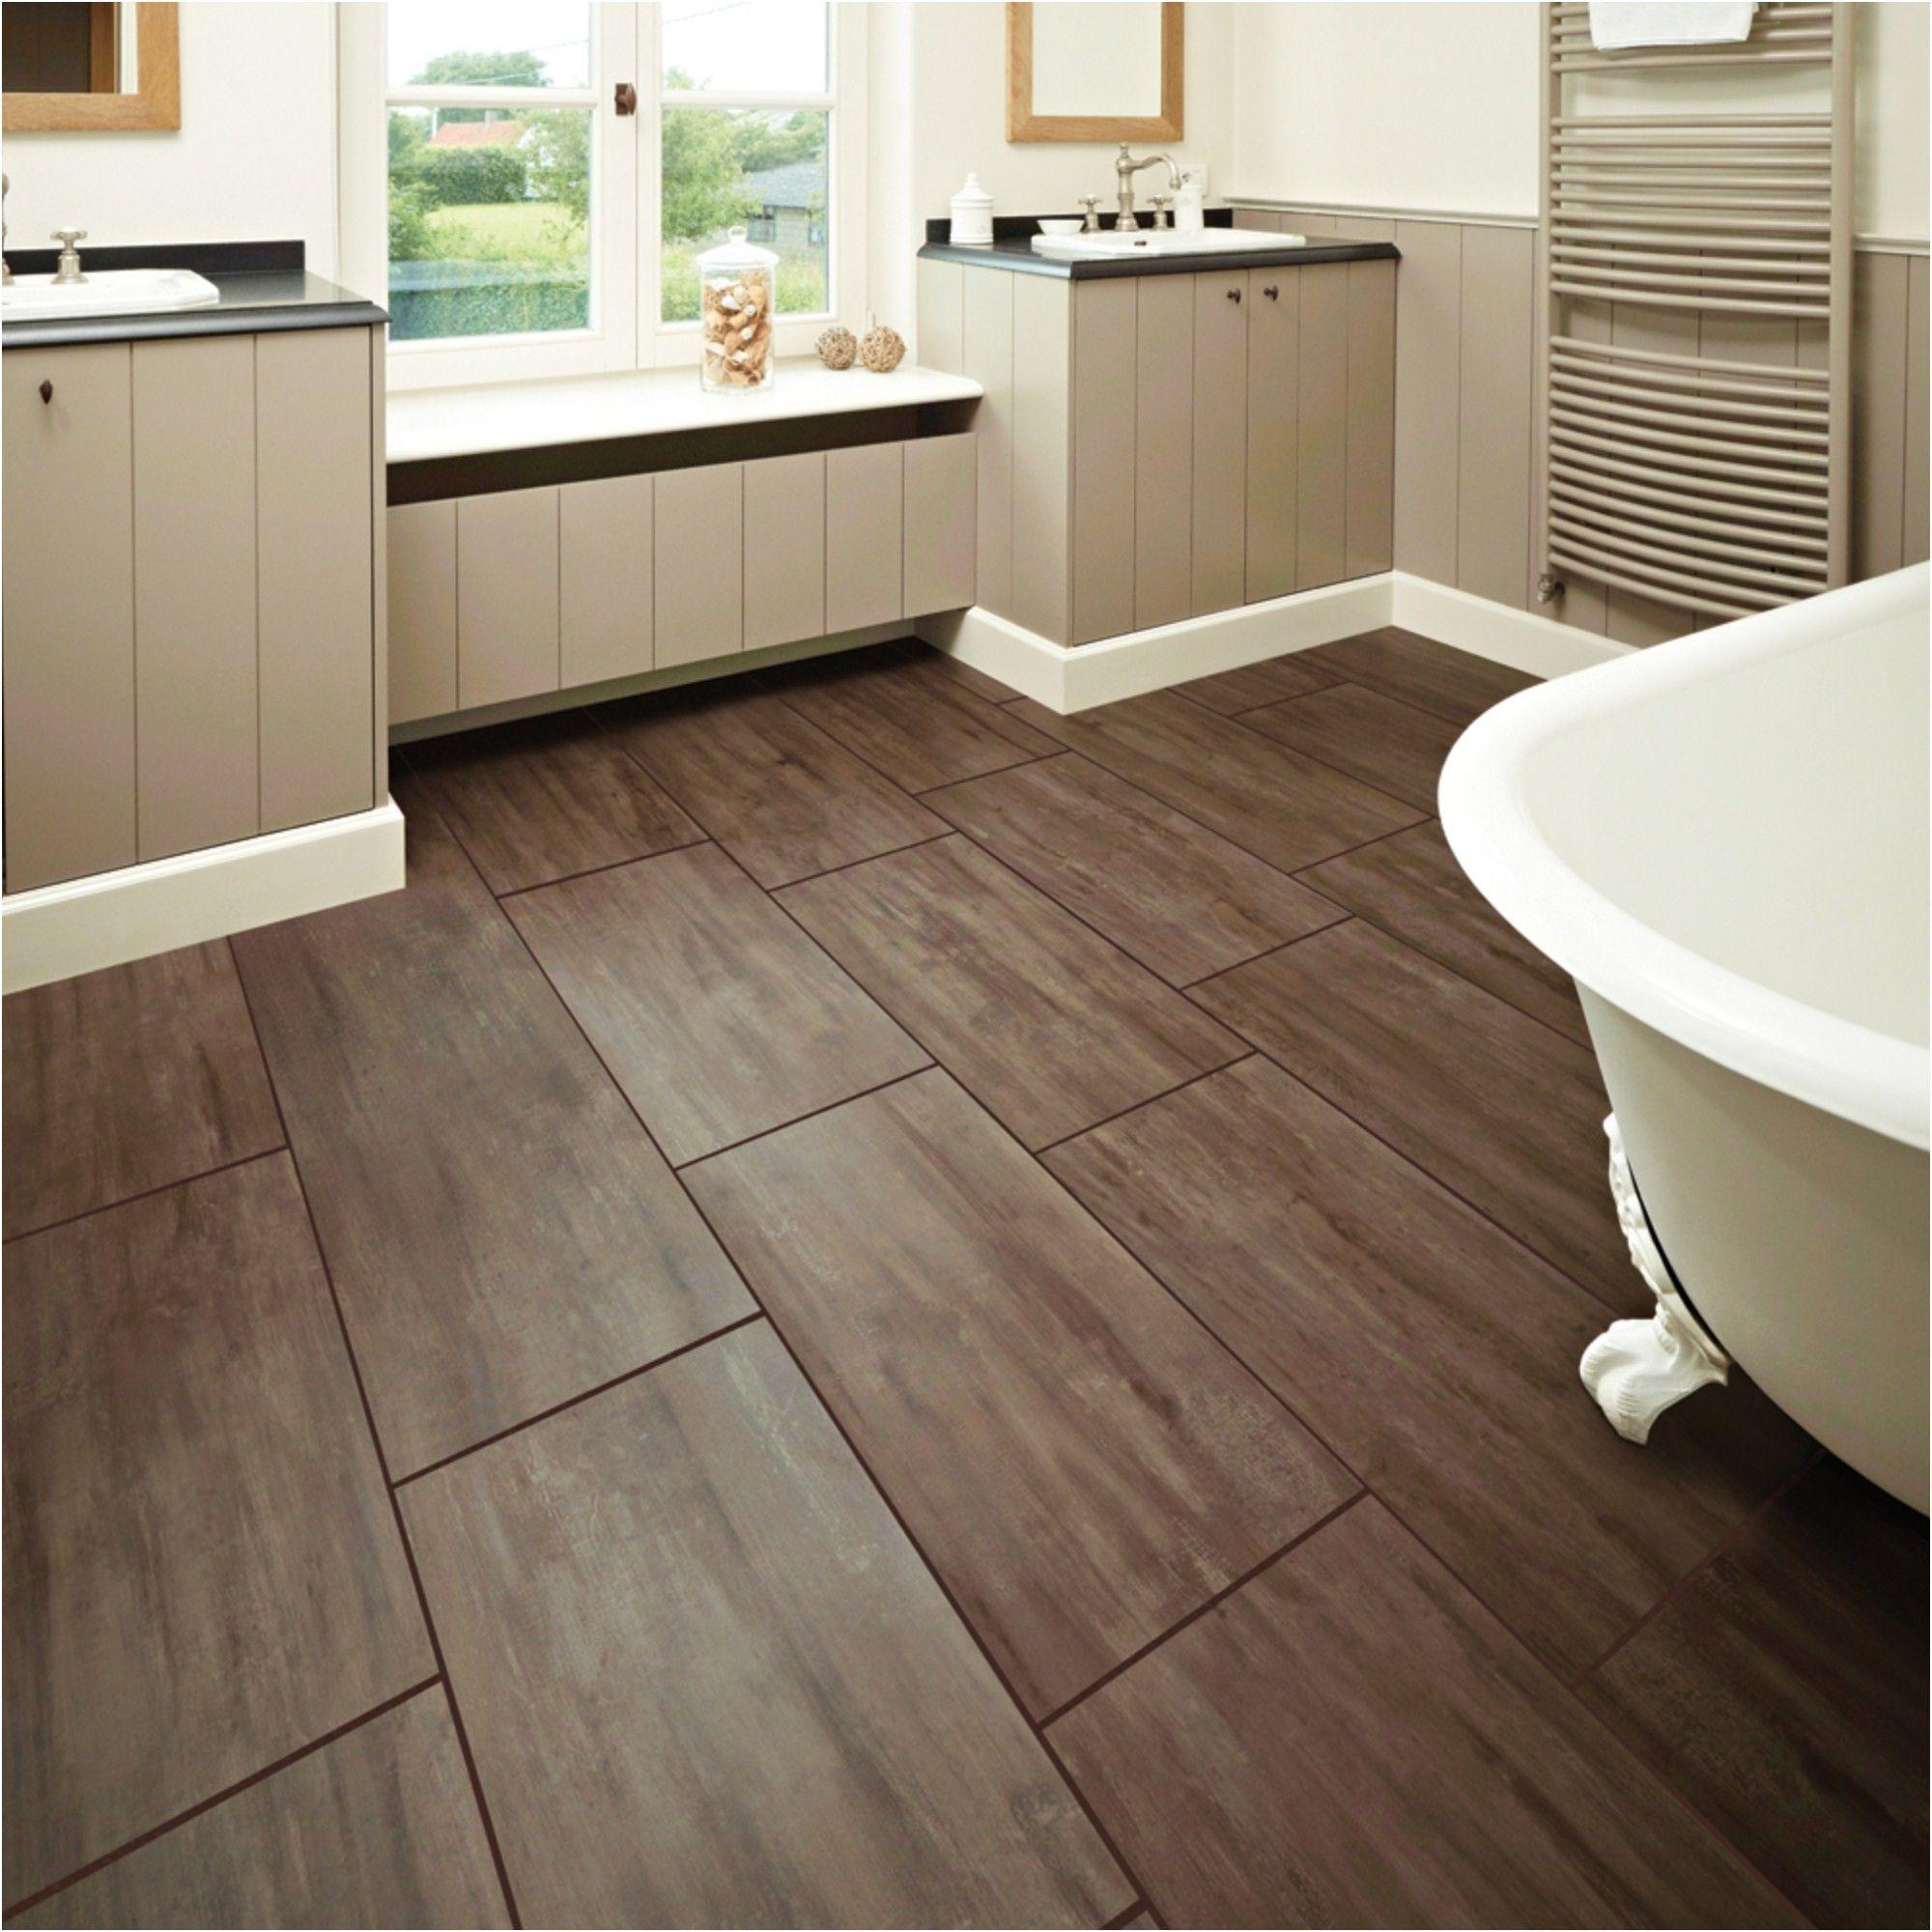 Unique Vinyl Bathroom Flooring Tiles | Kamar mandi, Mandi ...